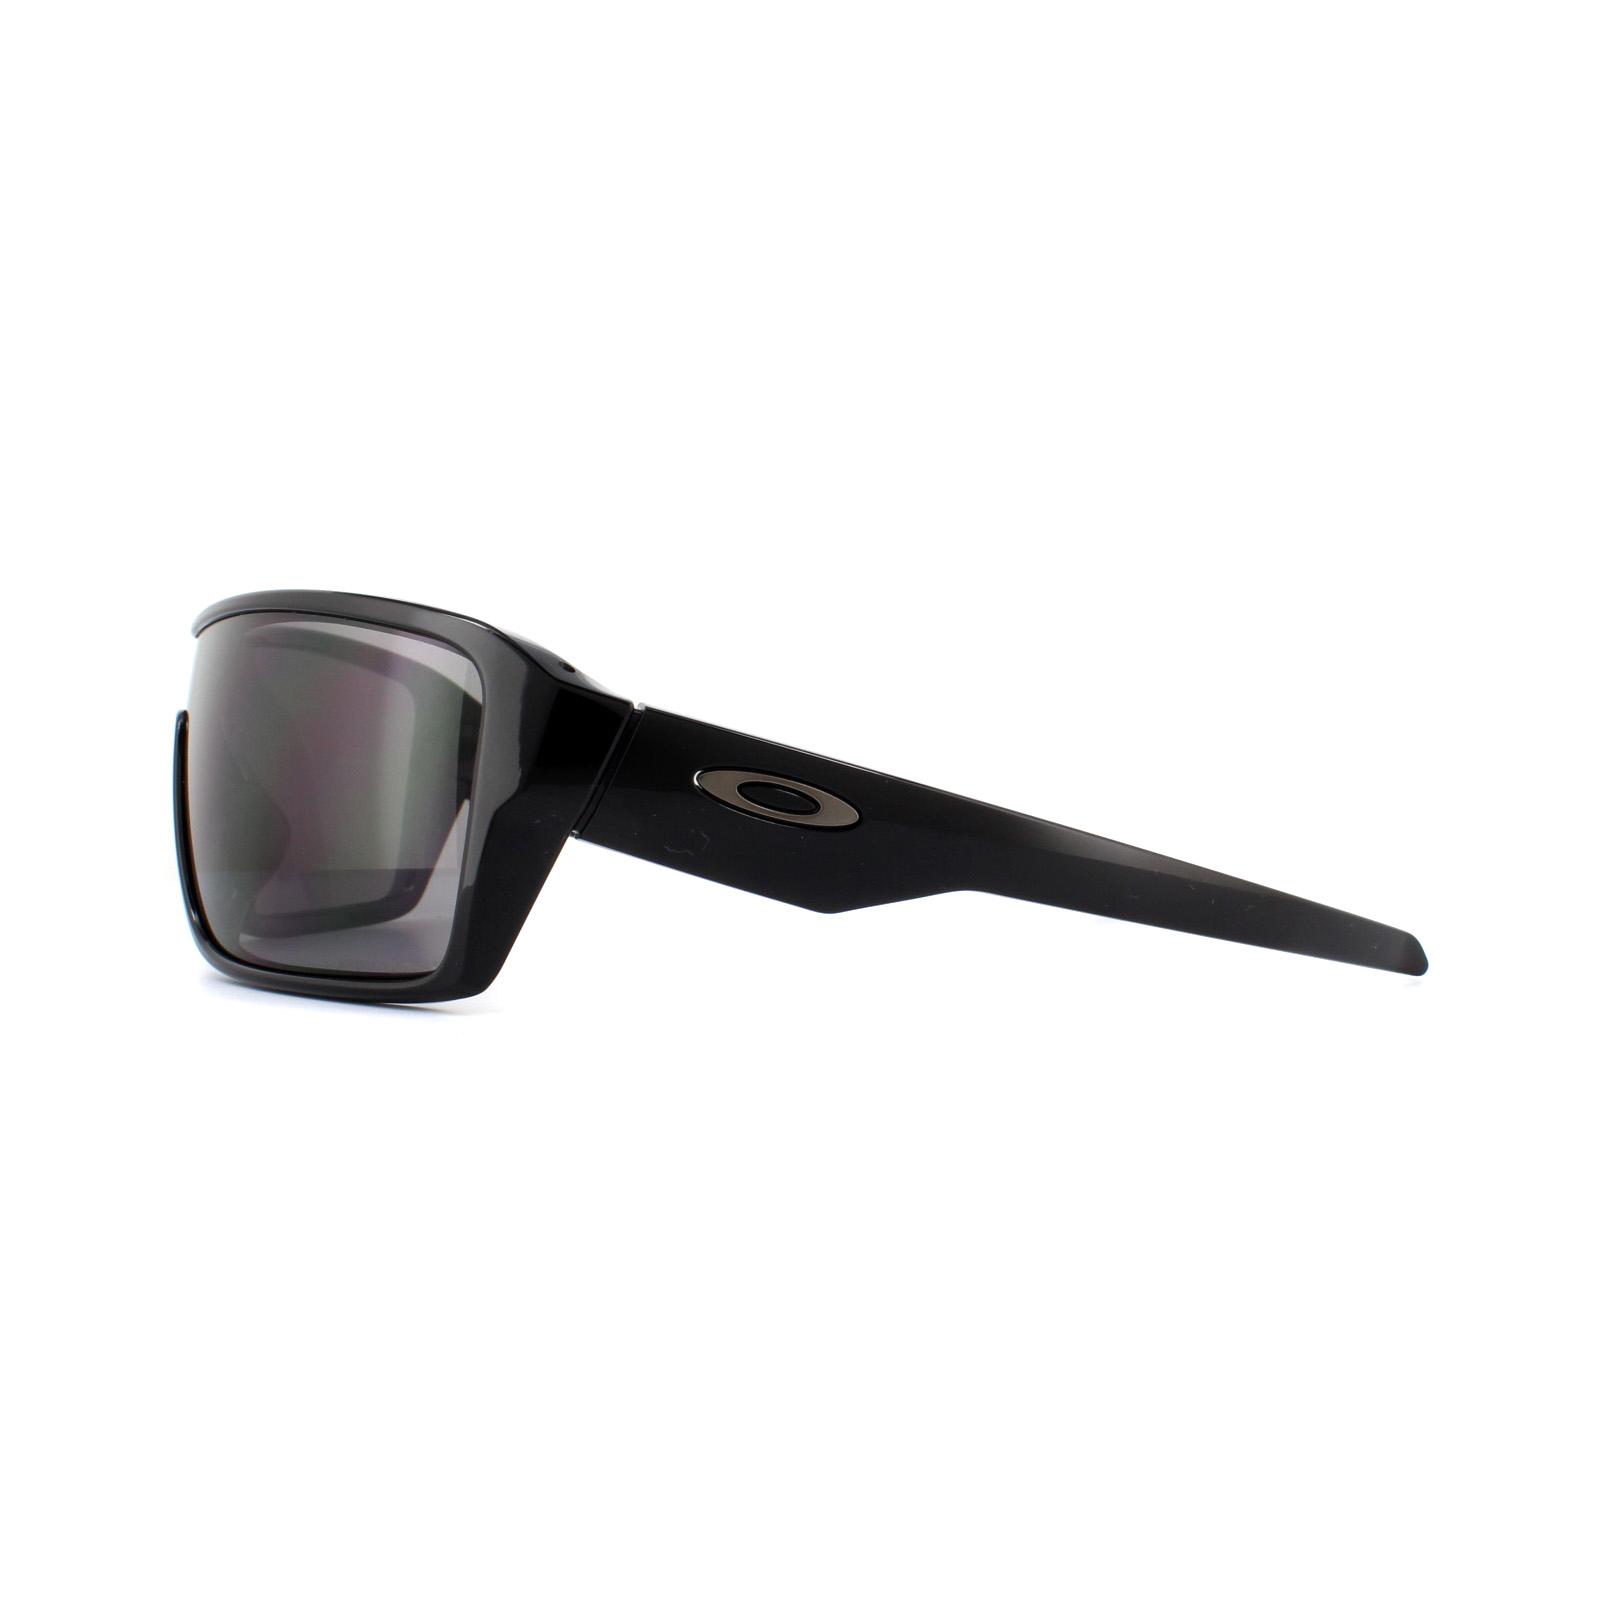 9cd20346f5 Cheap Oakley Ridgeline Sunglasses - Discounted Sunglasses